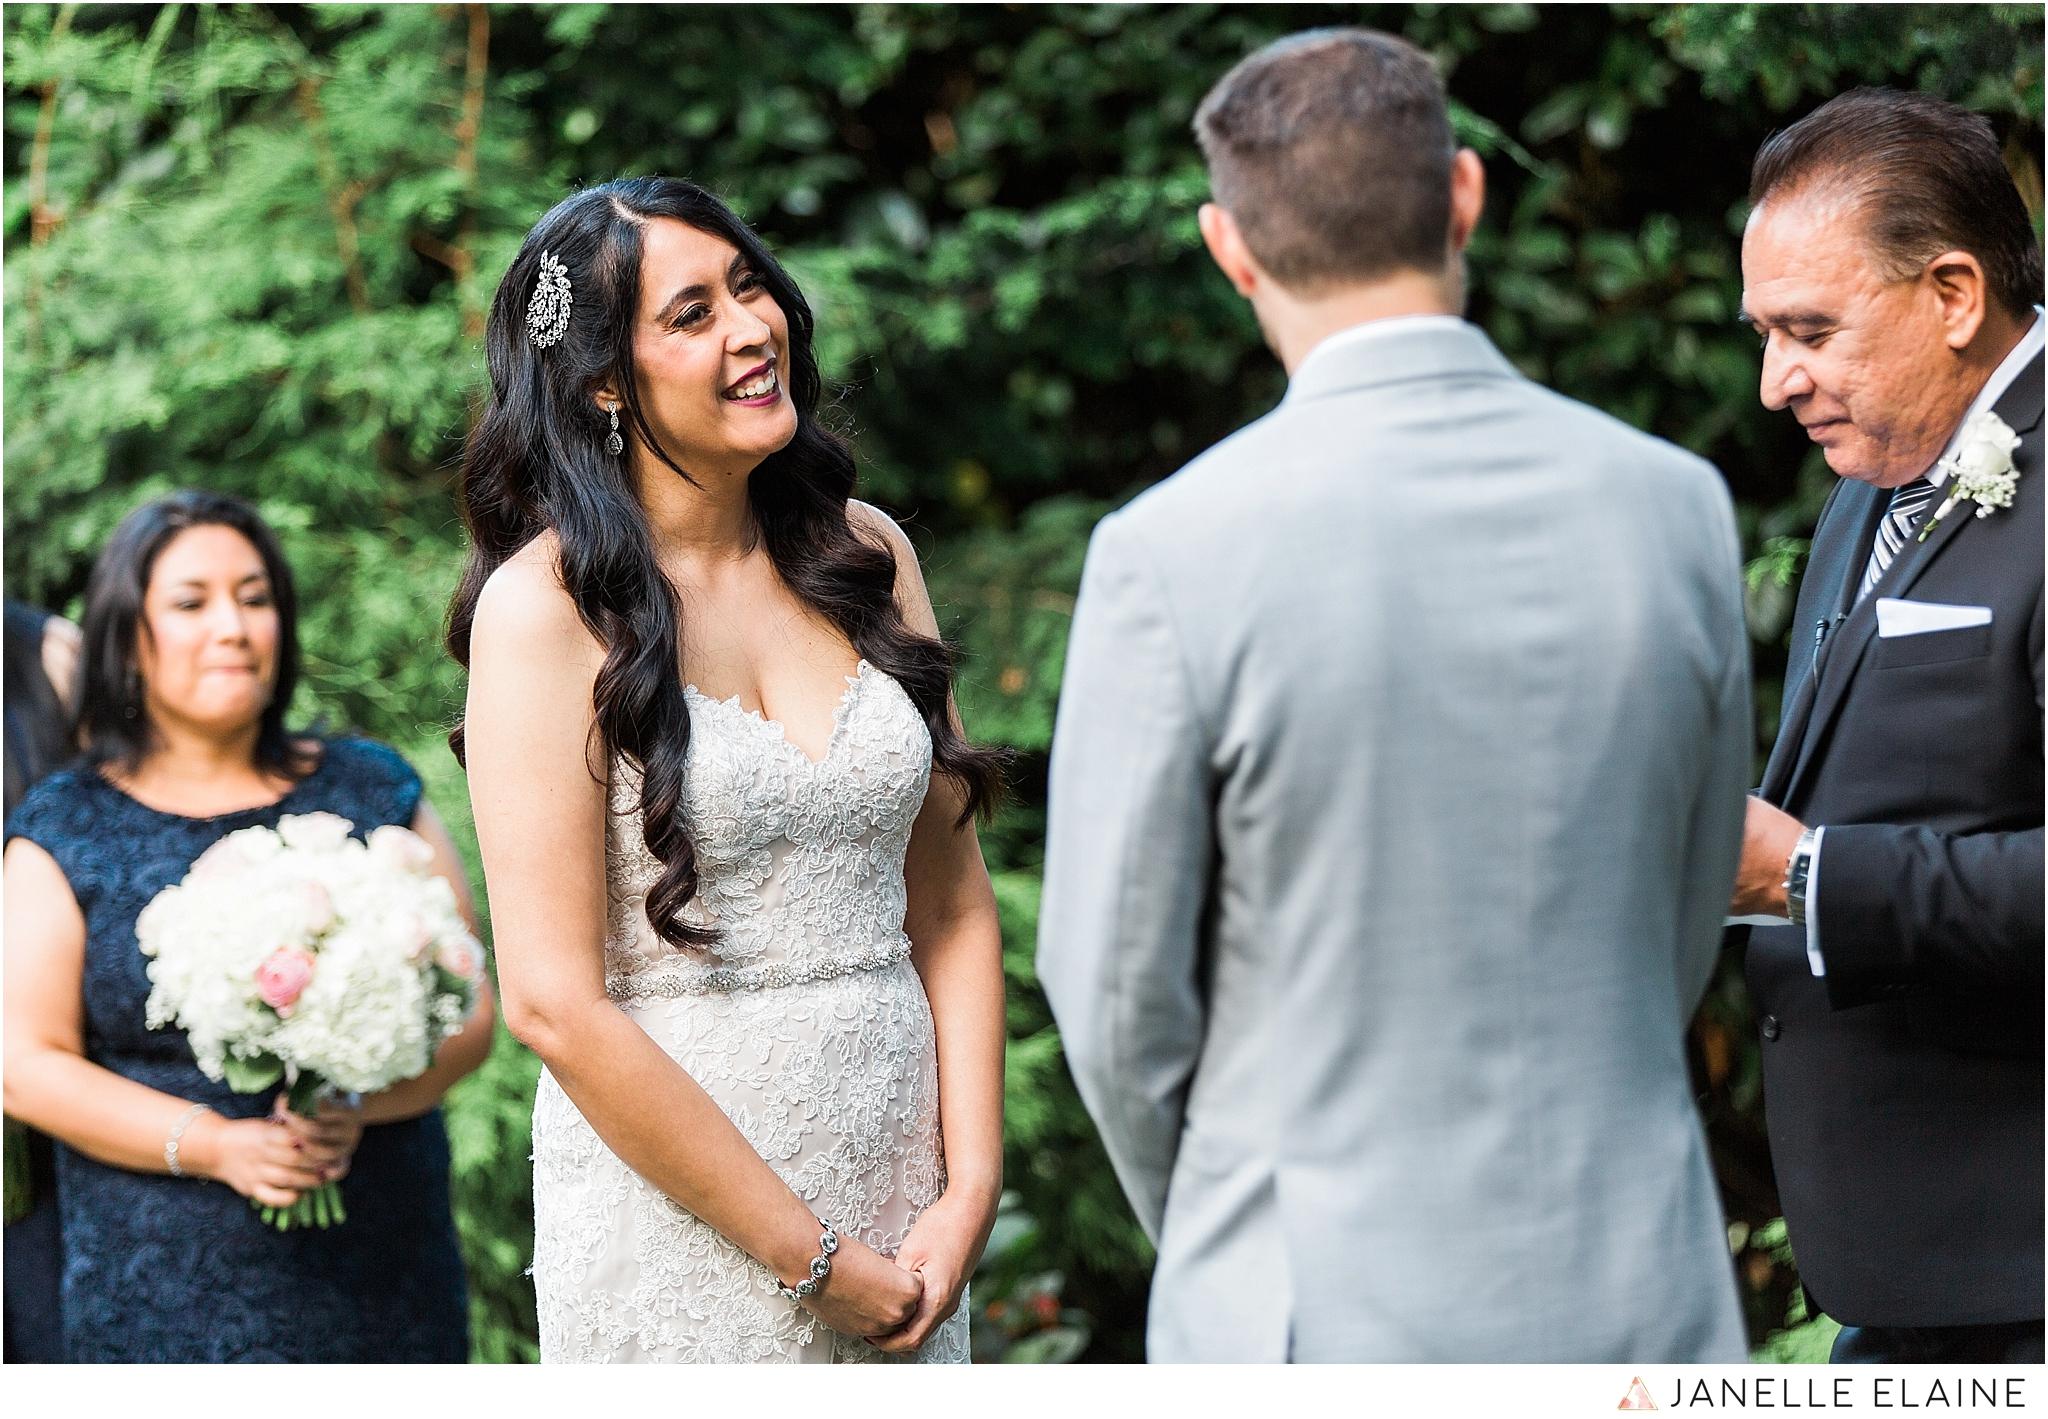 janelle elaine photography-professional wedding photographer-seattle-bellevue-robinswood house-145.jpg